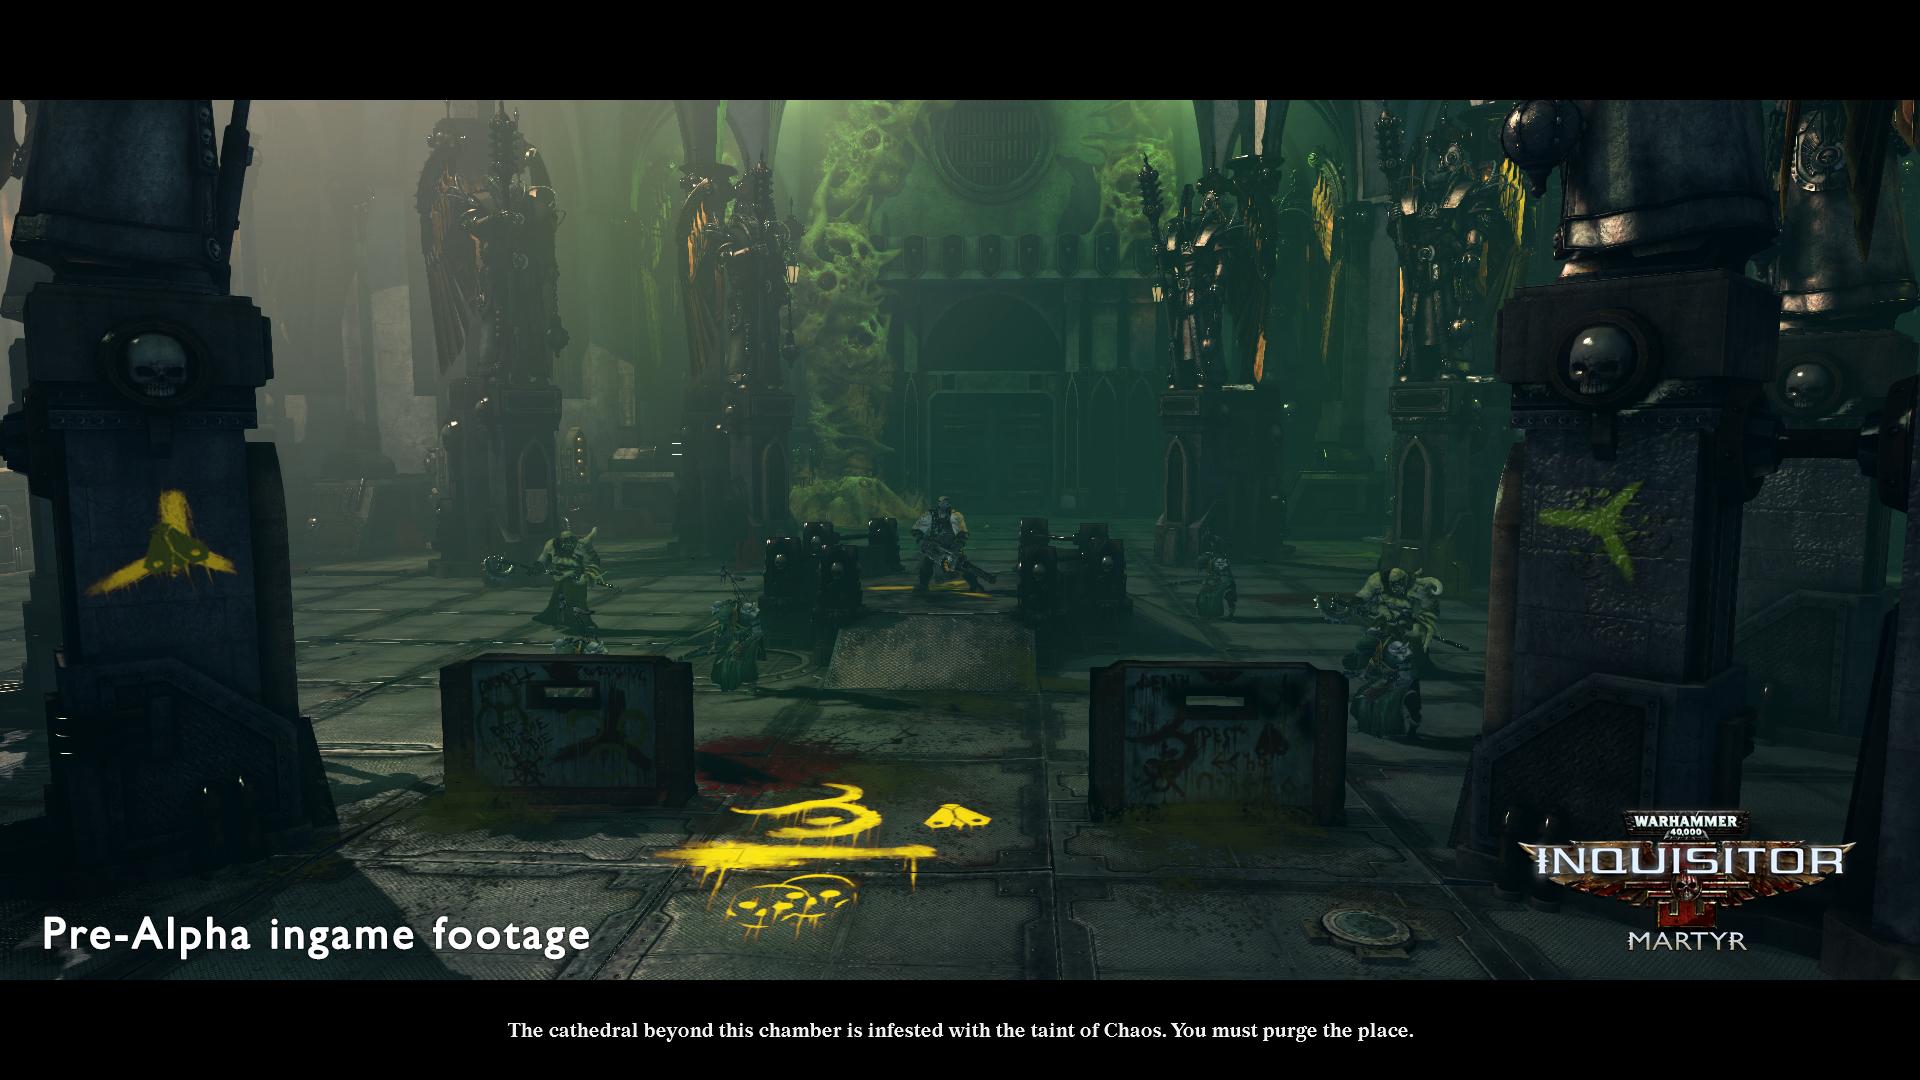 W40K_Inquisitor_Martyr_PreAlpphaScreenshot__4_-pc-games.jpg